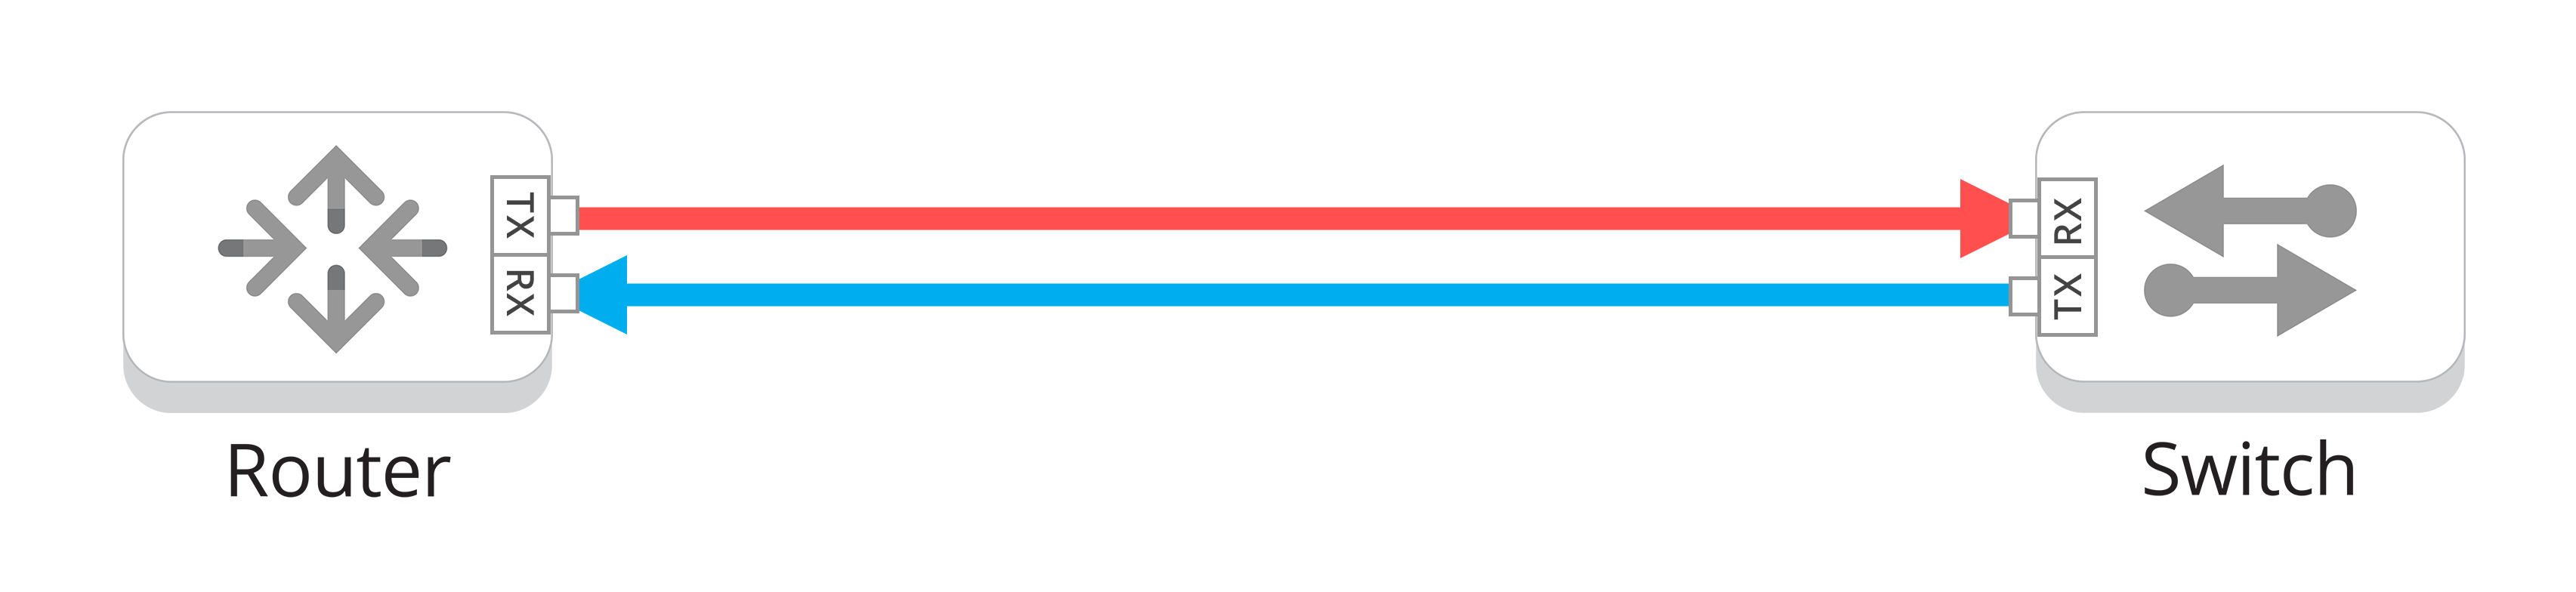 Fiber Polarity Traffic1